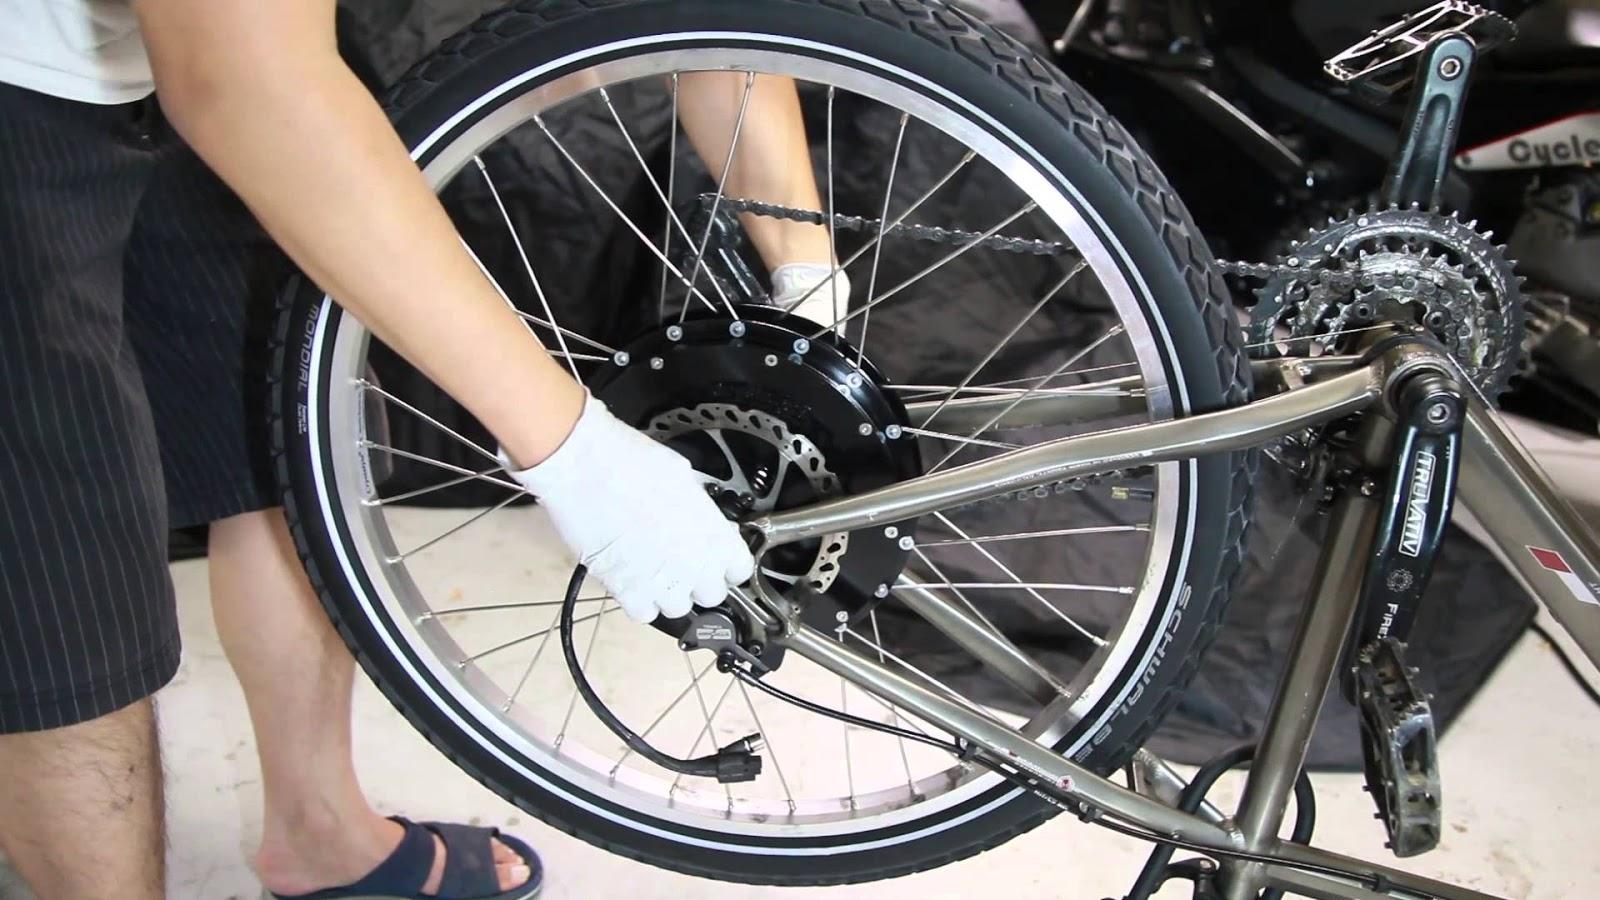 Merakit Sepeda Listrik Yang Hemat Dan Murah Ingin Rakit Atau Beli Jadi Electric Art Bogipower Com